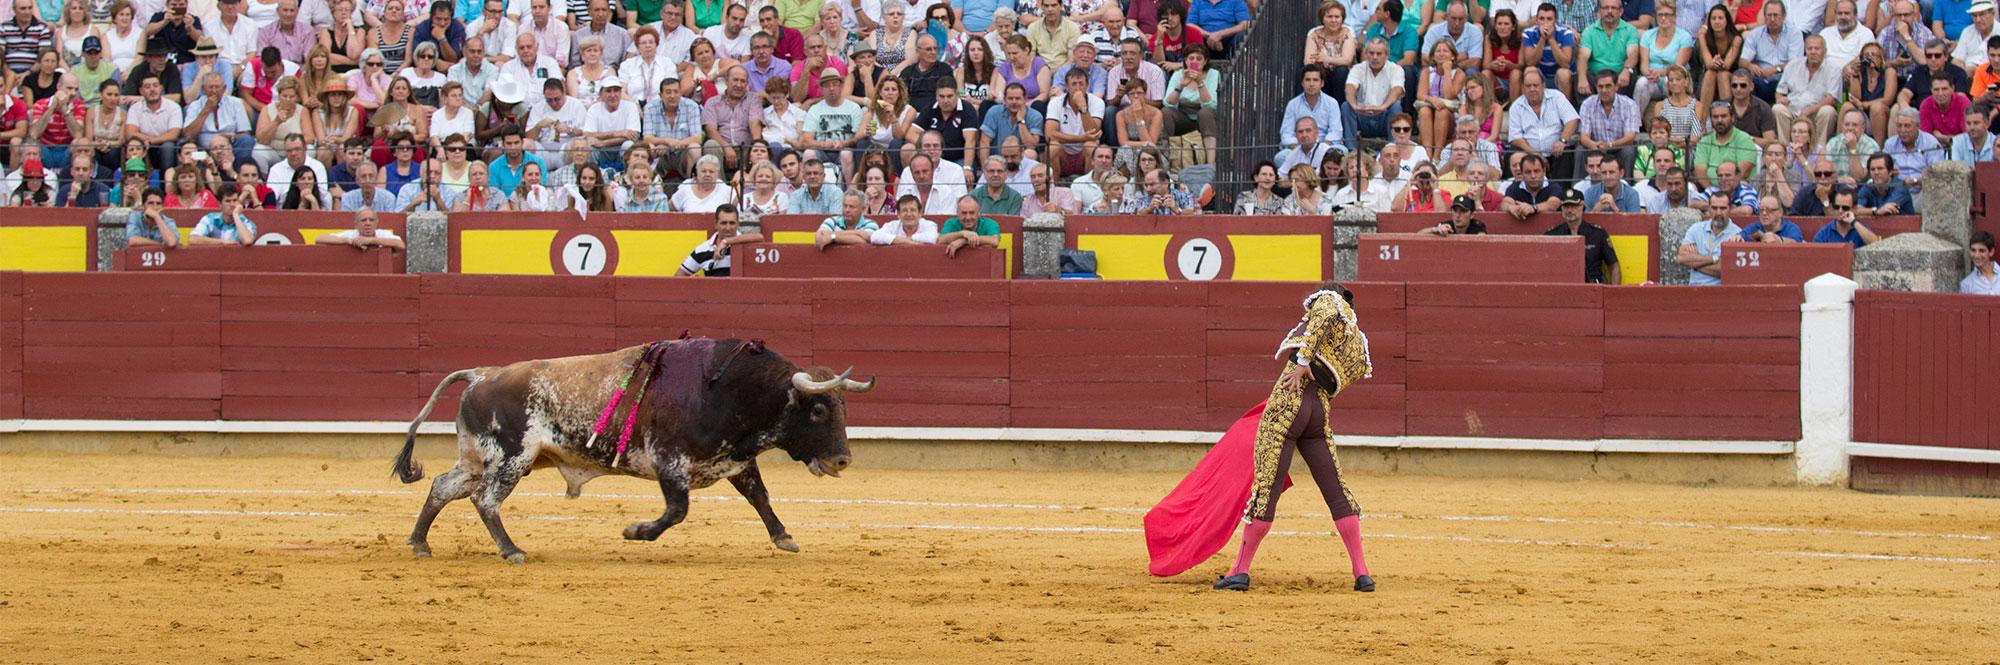 Maxitoro. Feria taurina de Ciudad Real